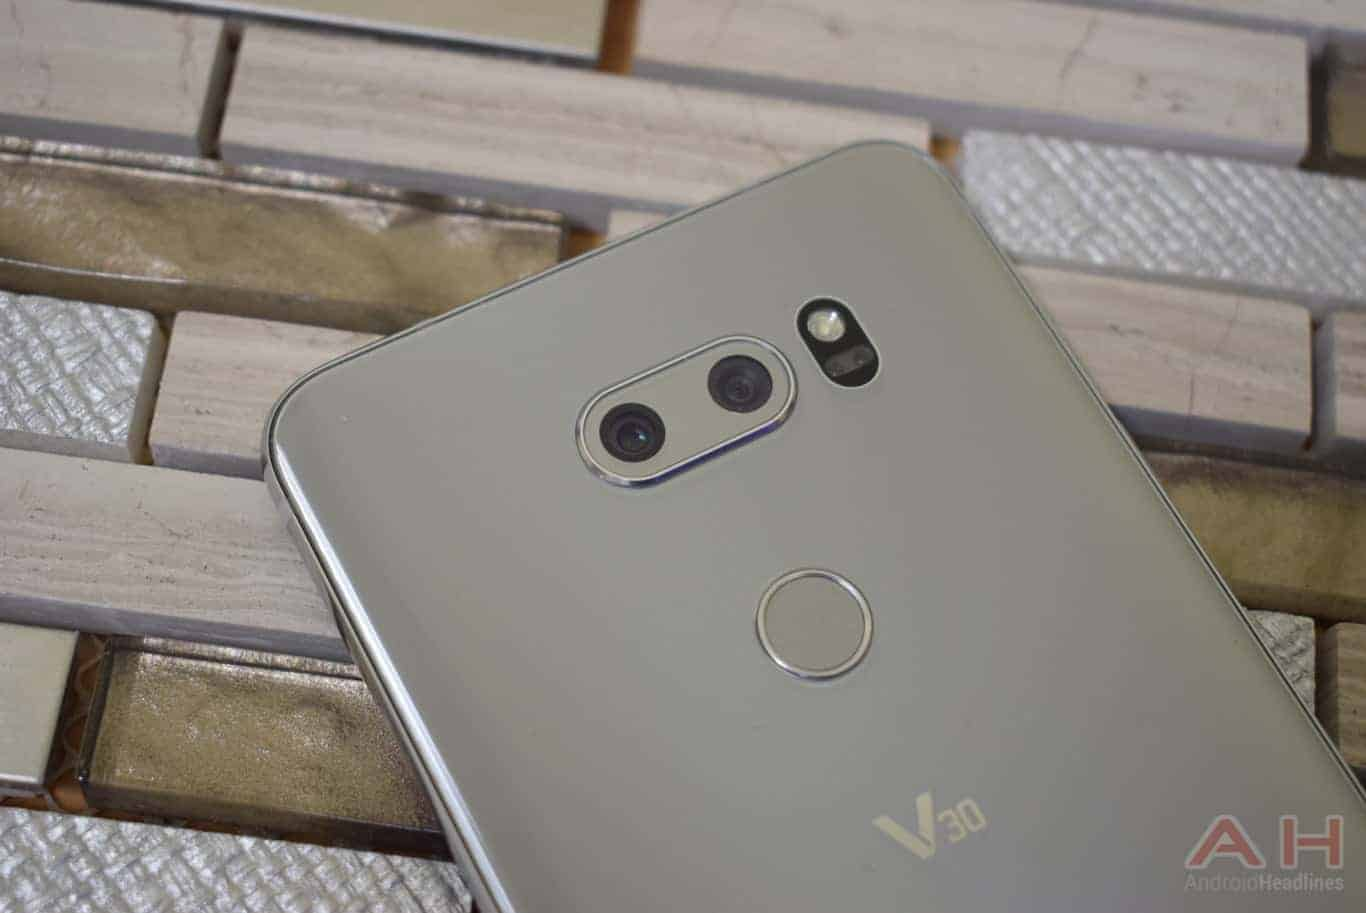 LG V30 Preview AM AH 20